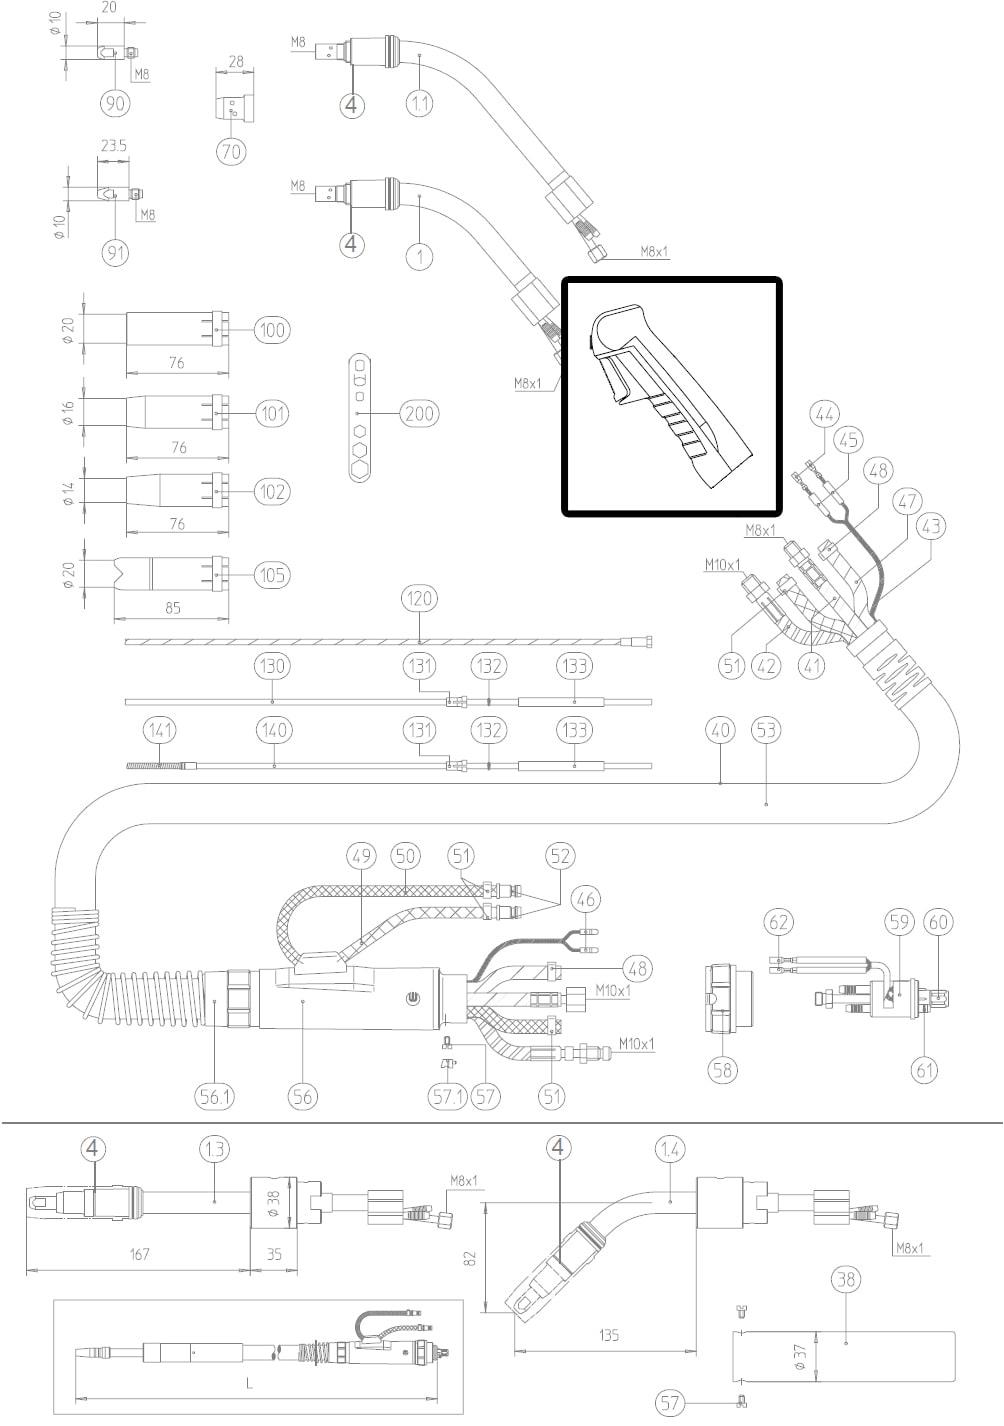 Dettaglio impugnatura ergo inferiore torcia mig abicor binzel BZ4000335